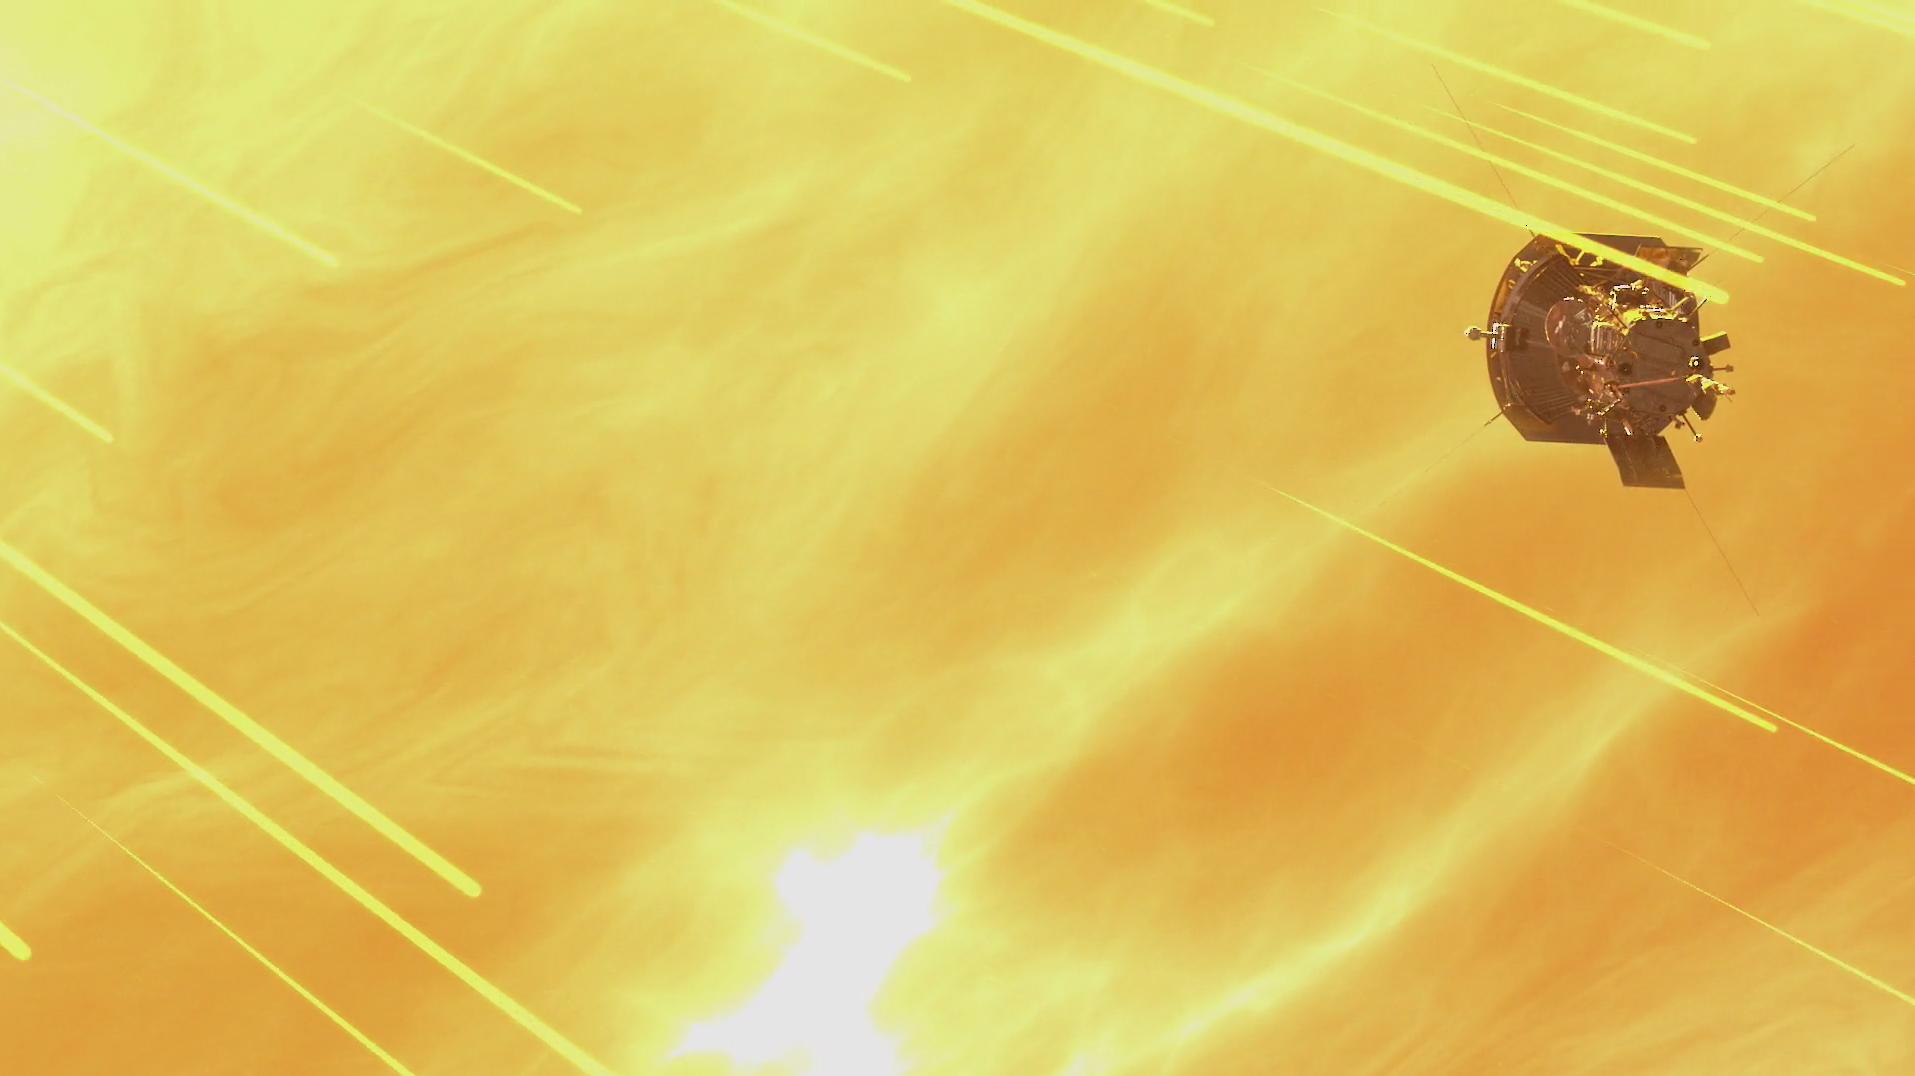 Parker Solar Probe, courtesy of NASA/APL